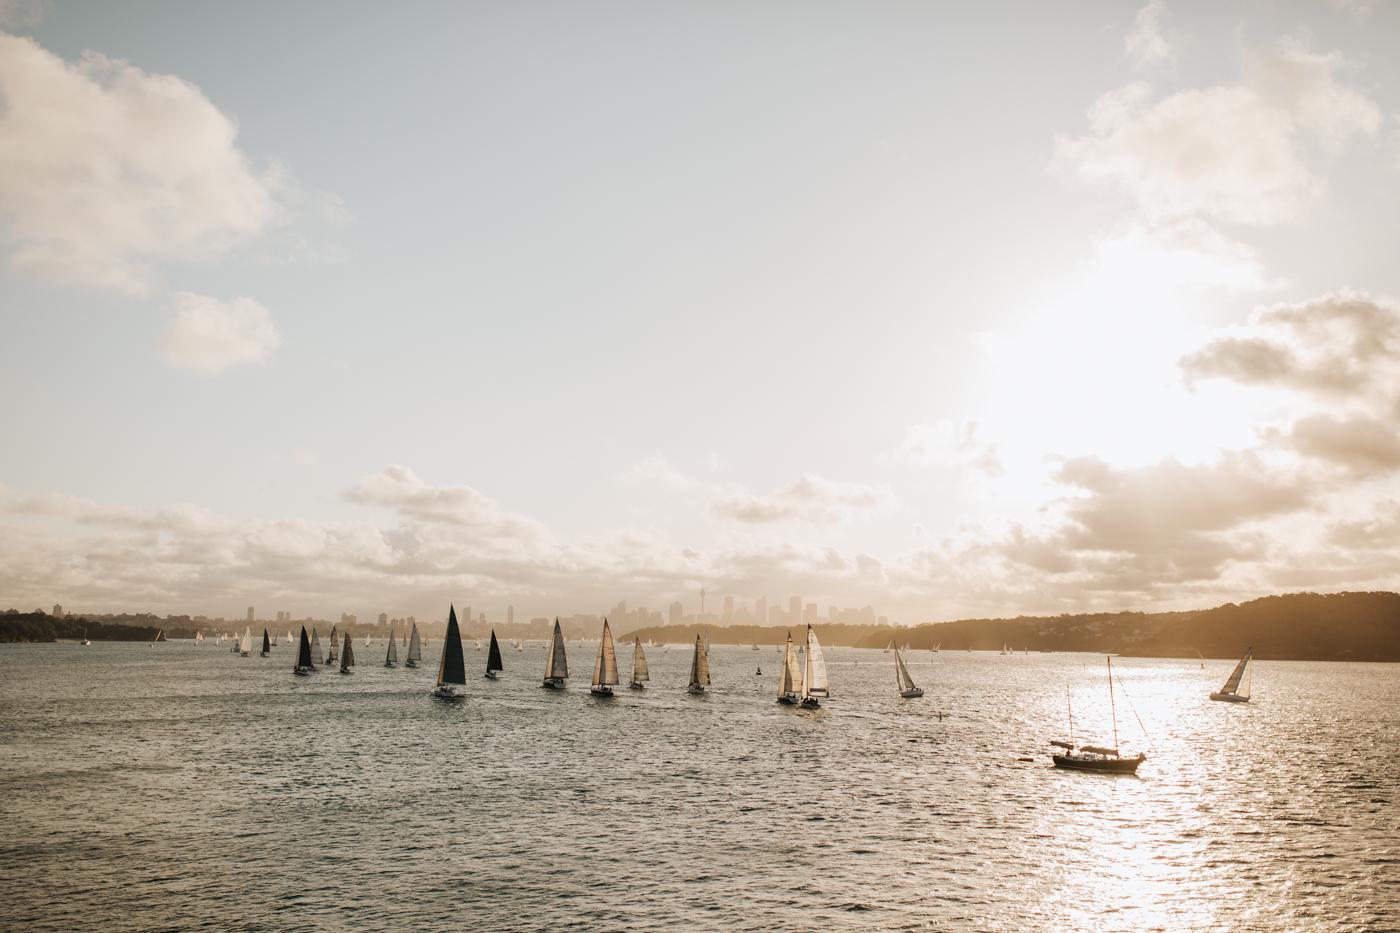 James & Caitie Engagement - Watsons Bay - Samantha Heather Photography-46.jpg